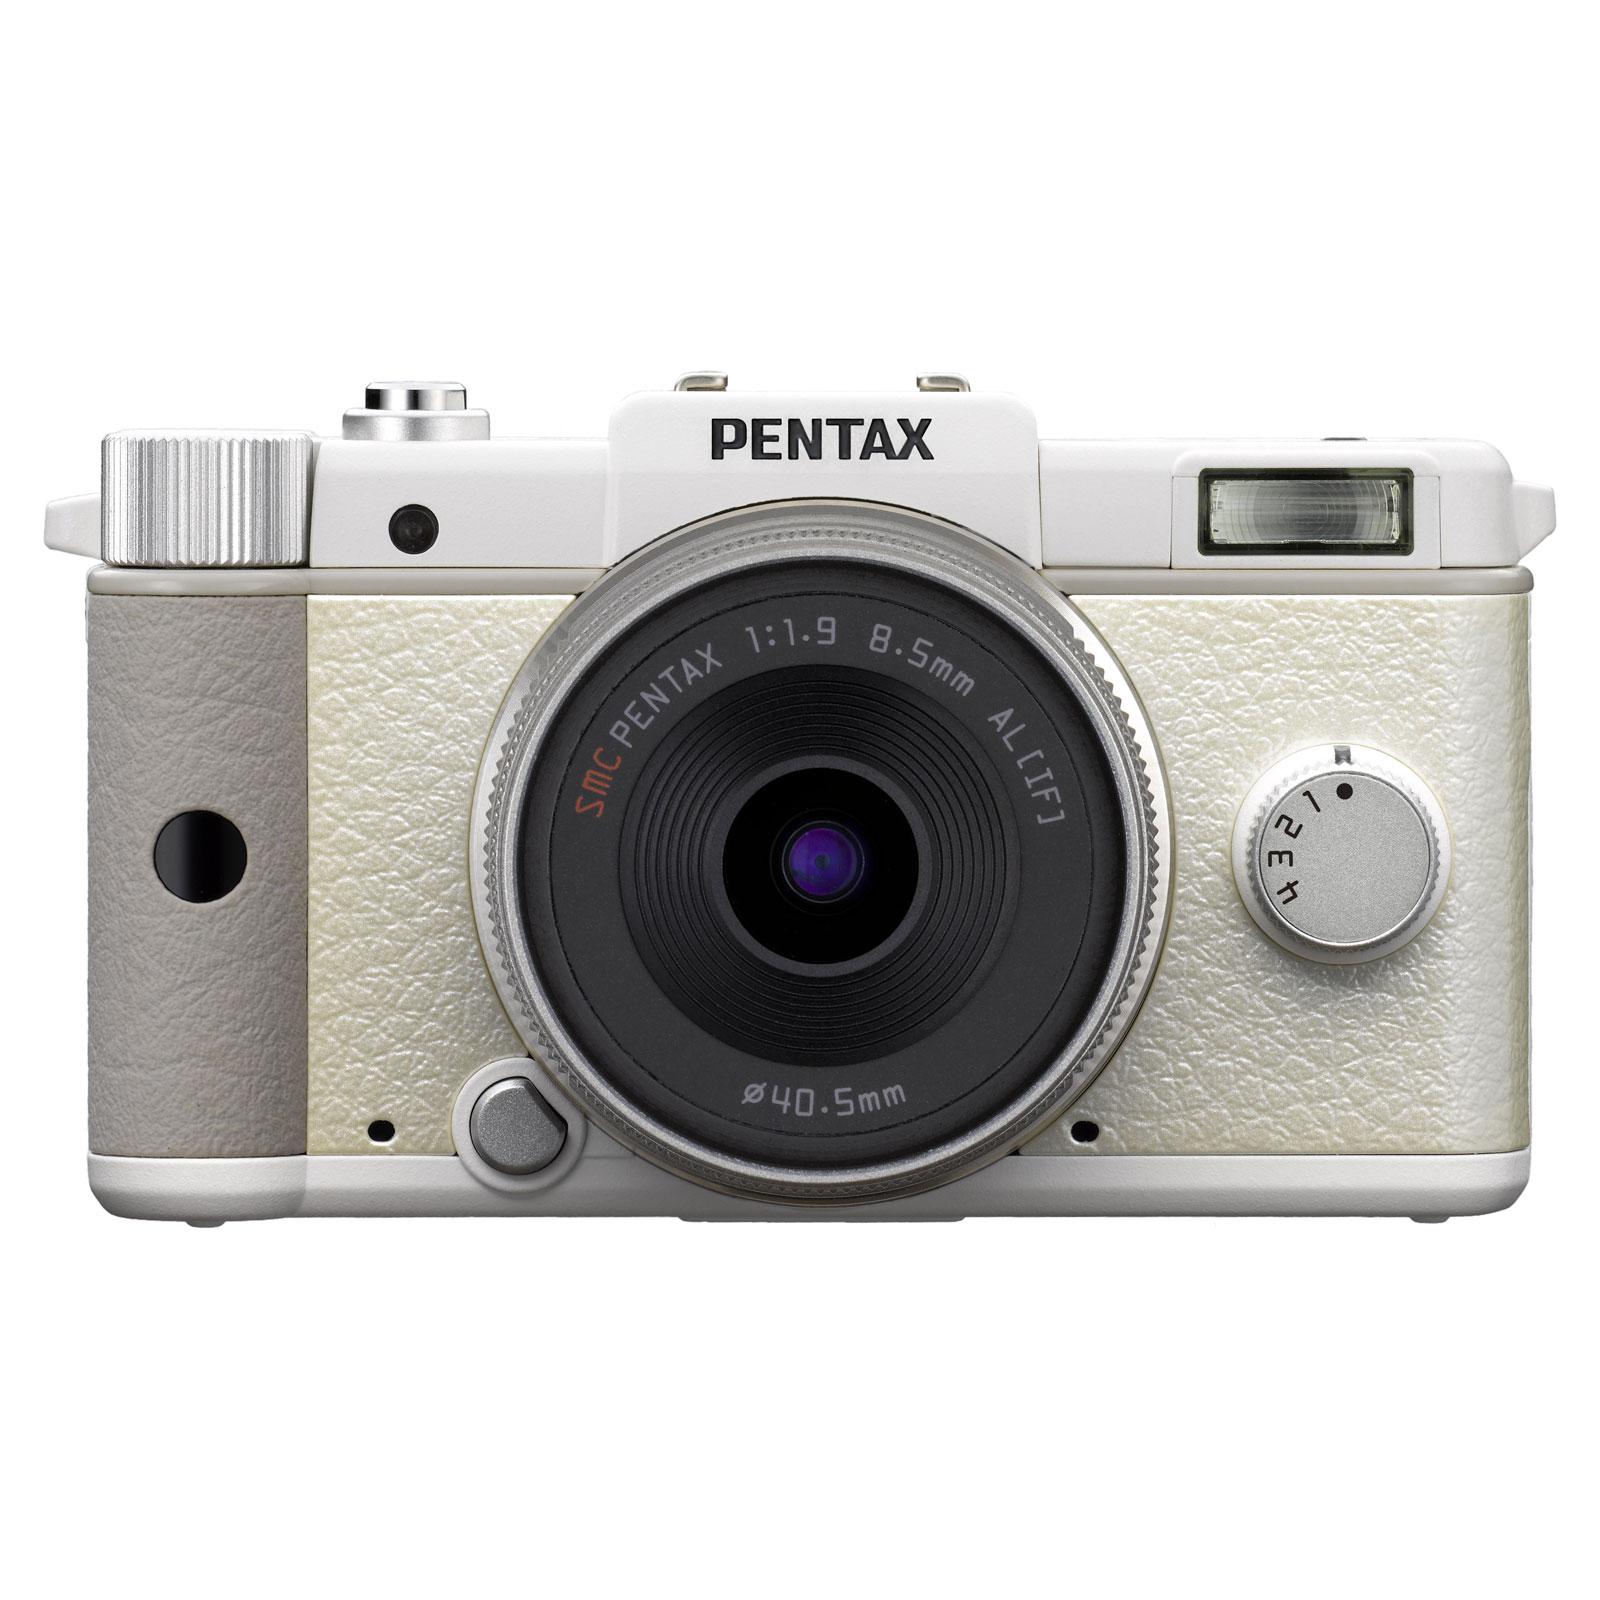 pentax q blanc objectif f 1 9 al appareil photo hybride pentax sur. Black Bedroom Furniture Sets. Home Design Ideas